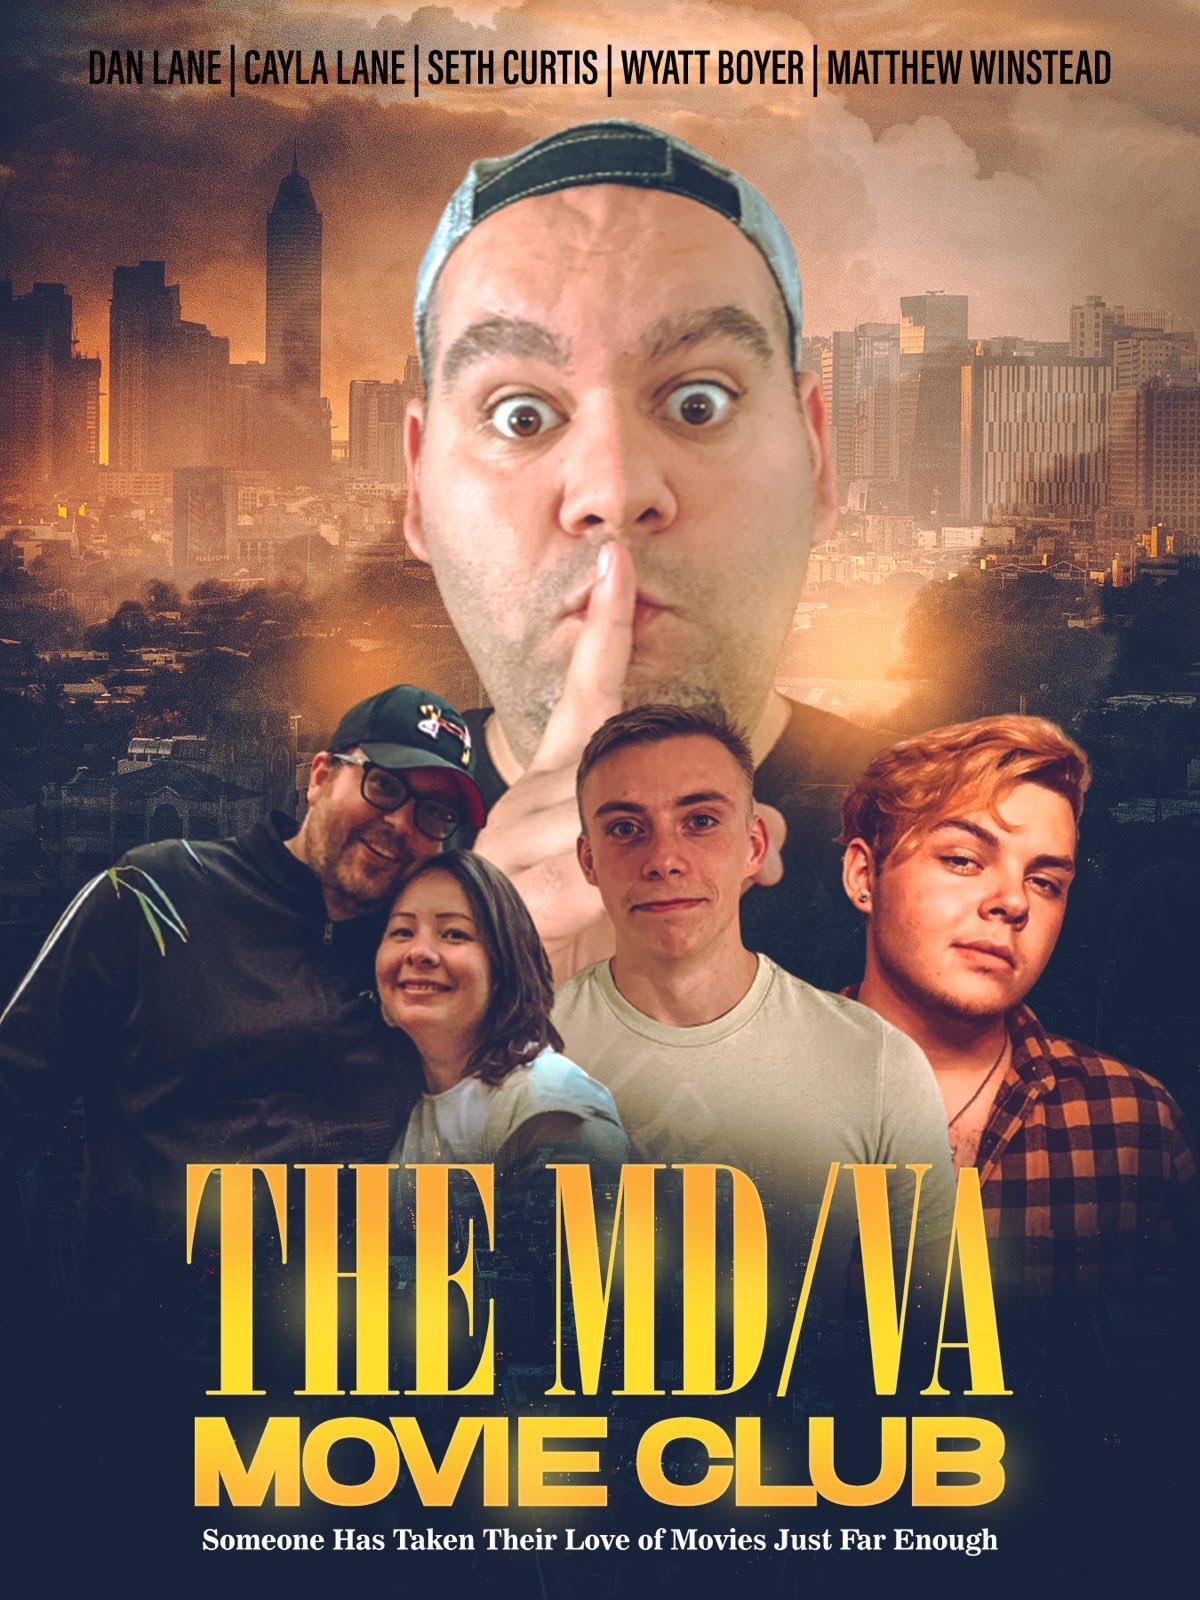 The MD/VA Movie Club